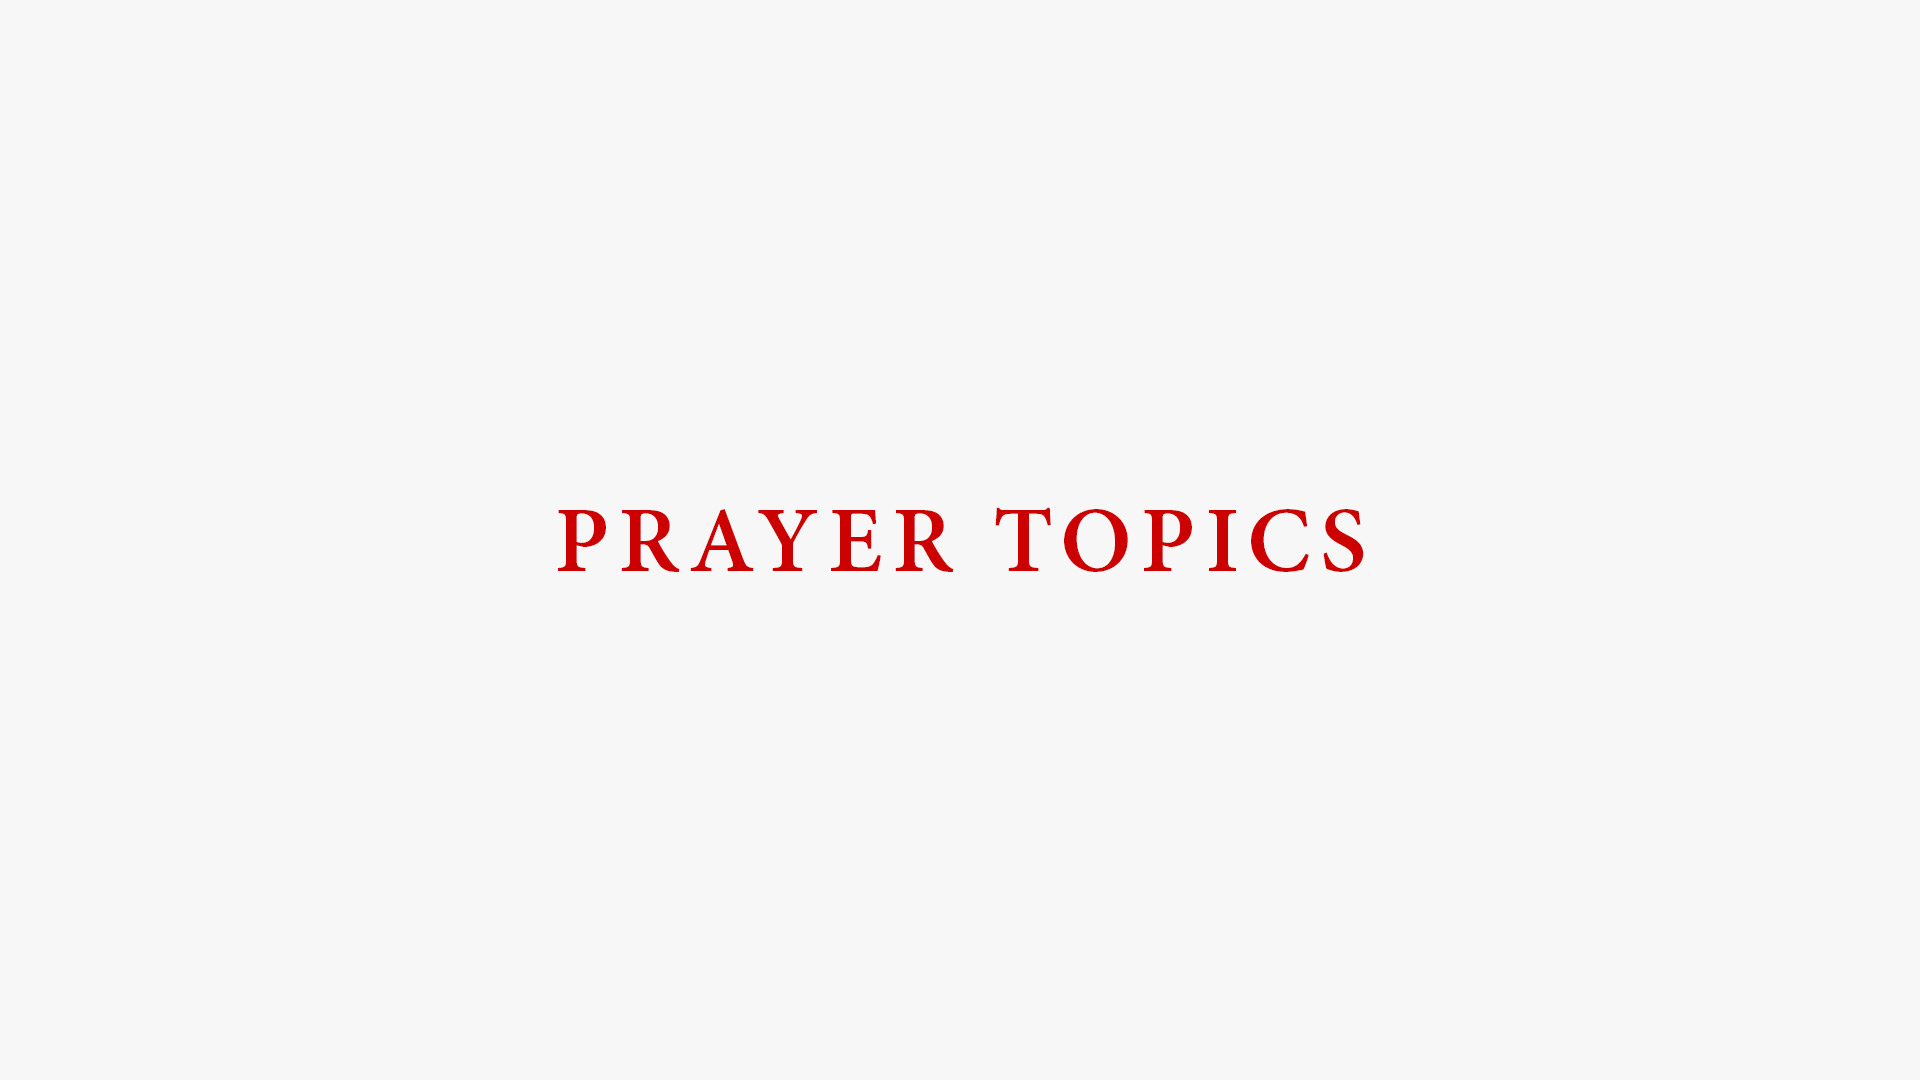 Daily Prayer Topics